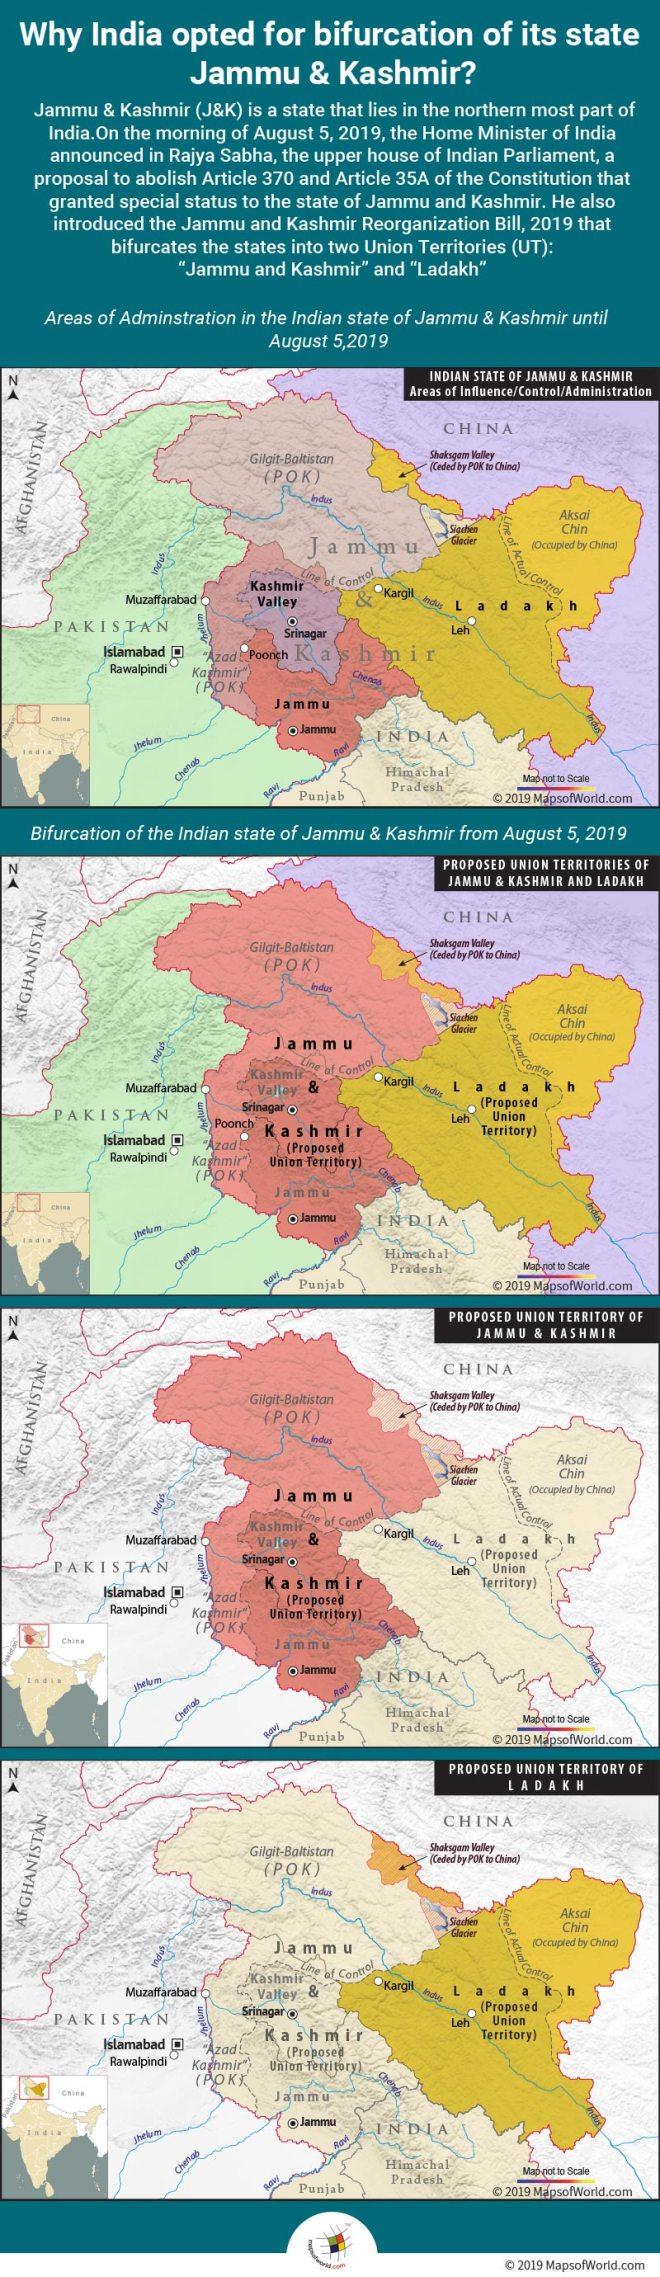 Bifurcation of the Indian State Jammu and Kashmir